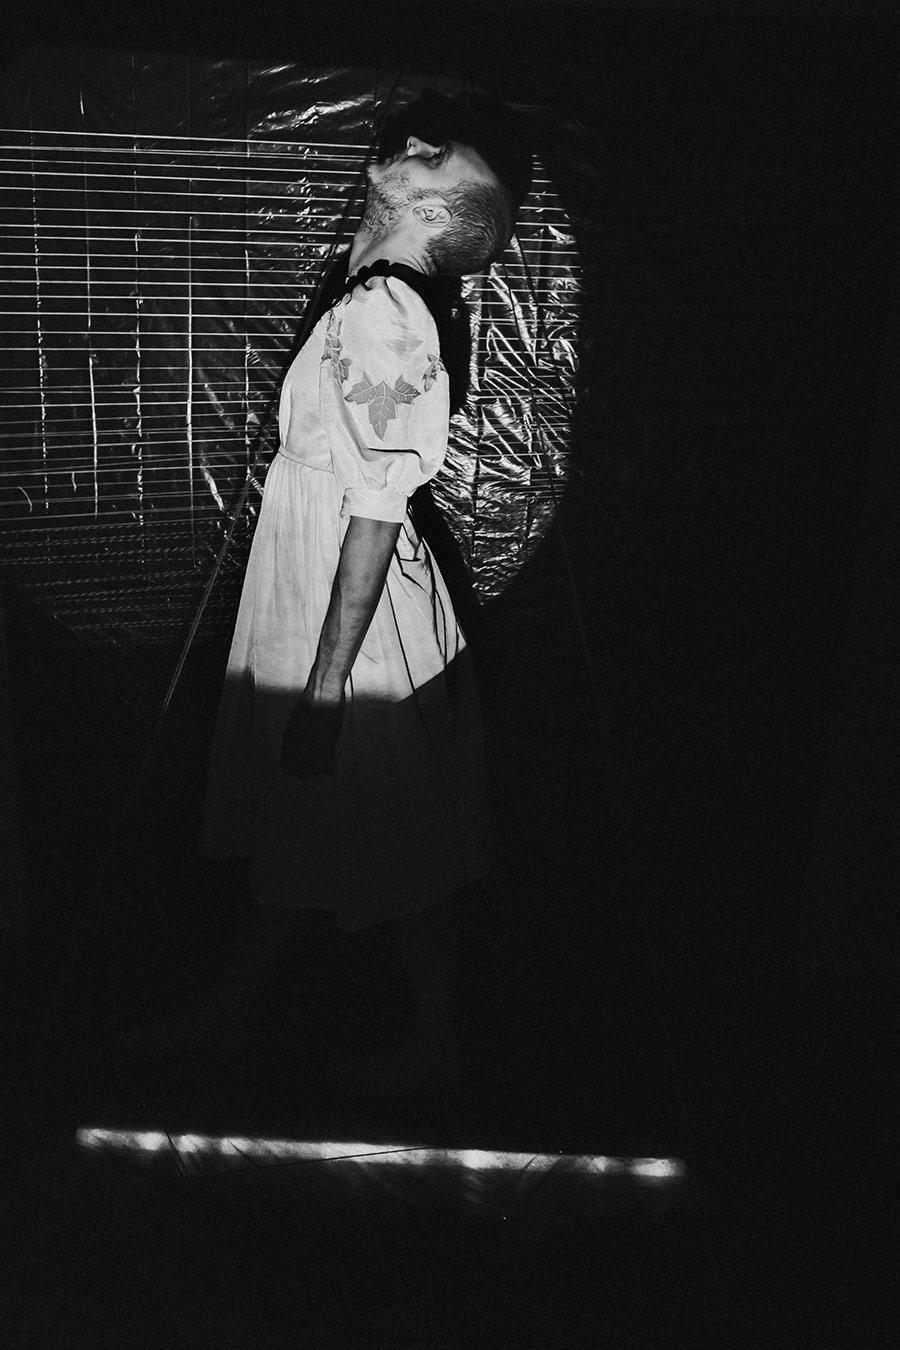 CAMERA OBSCURA, Fotoserie von Antje Kröger